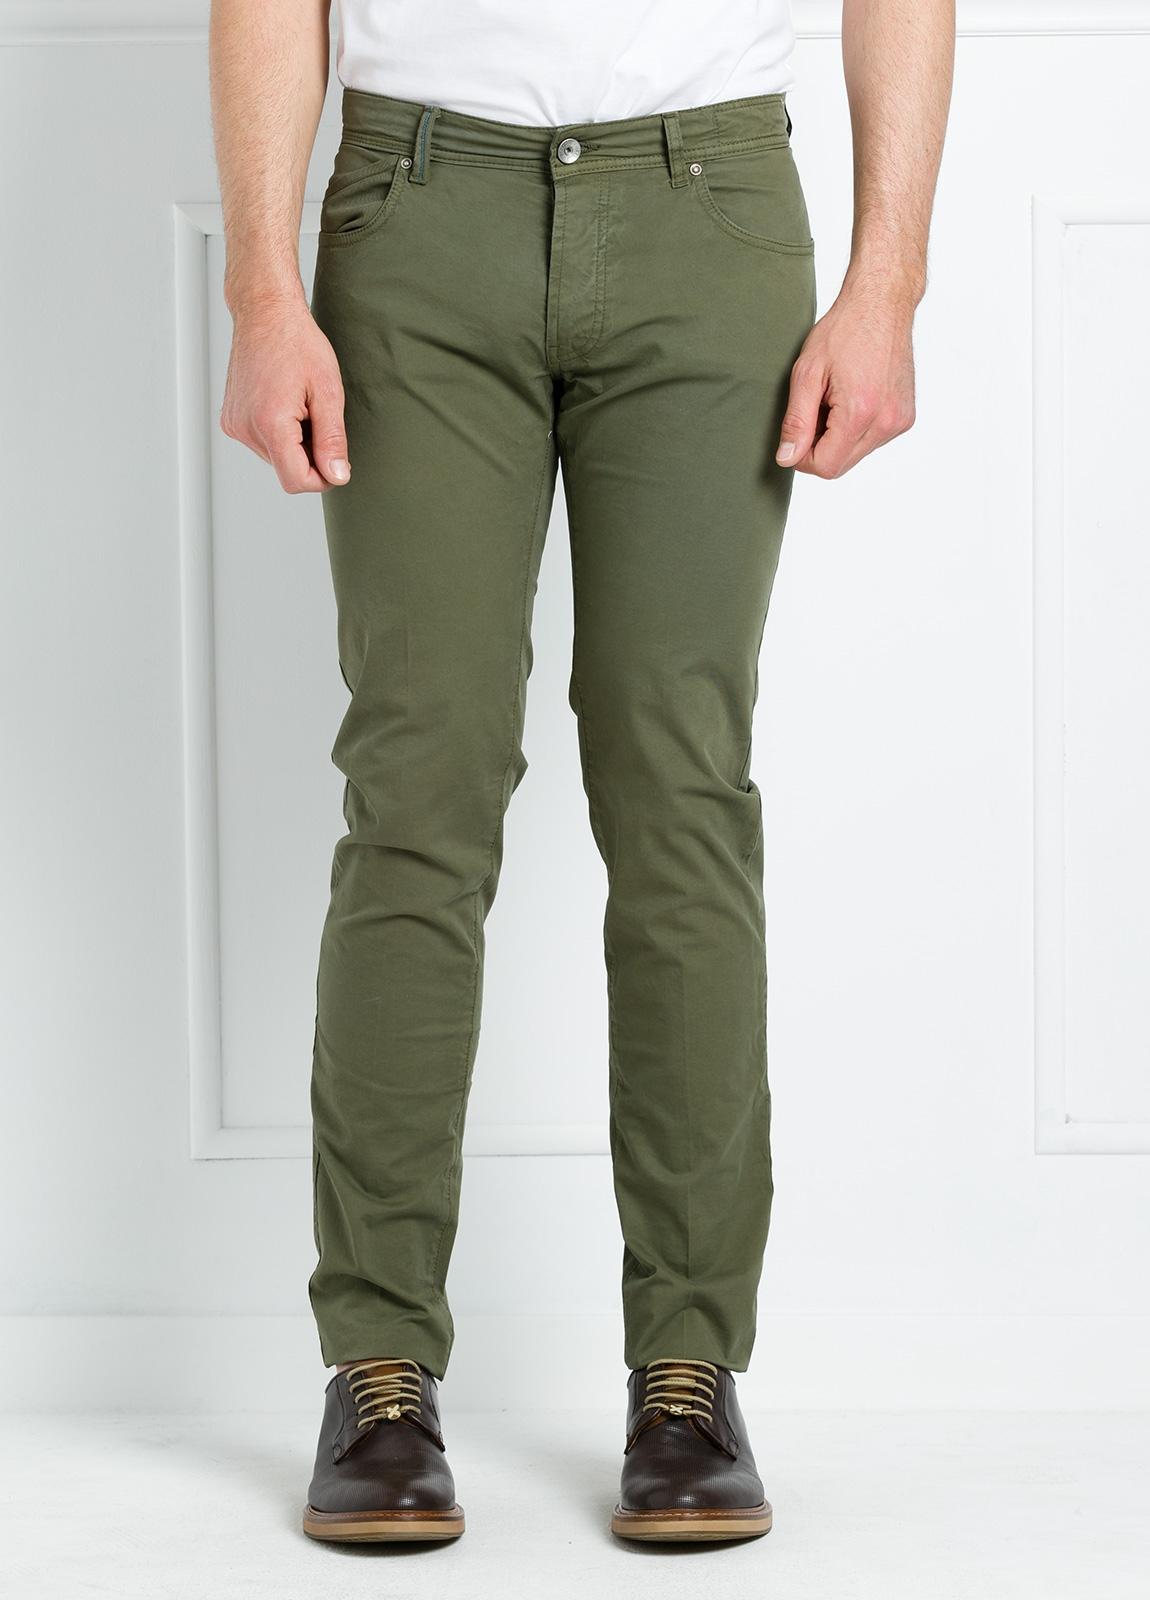 Pantalón sport regular fit modelo POLLOCK P 053 color kaki. 96% Algodón gabardina 4% Lycra. - Ítem1